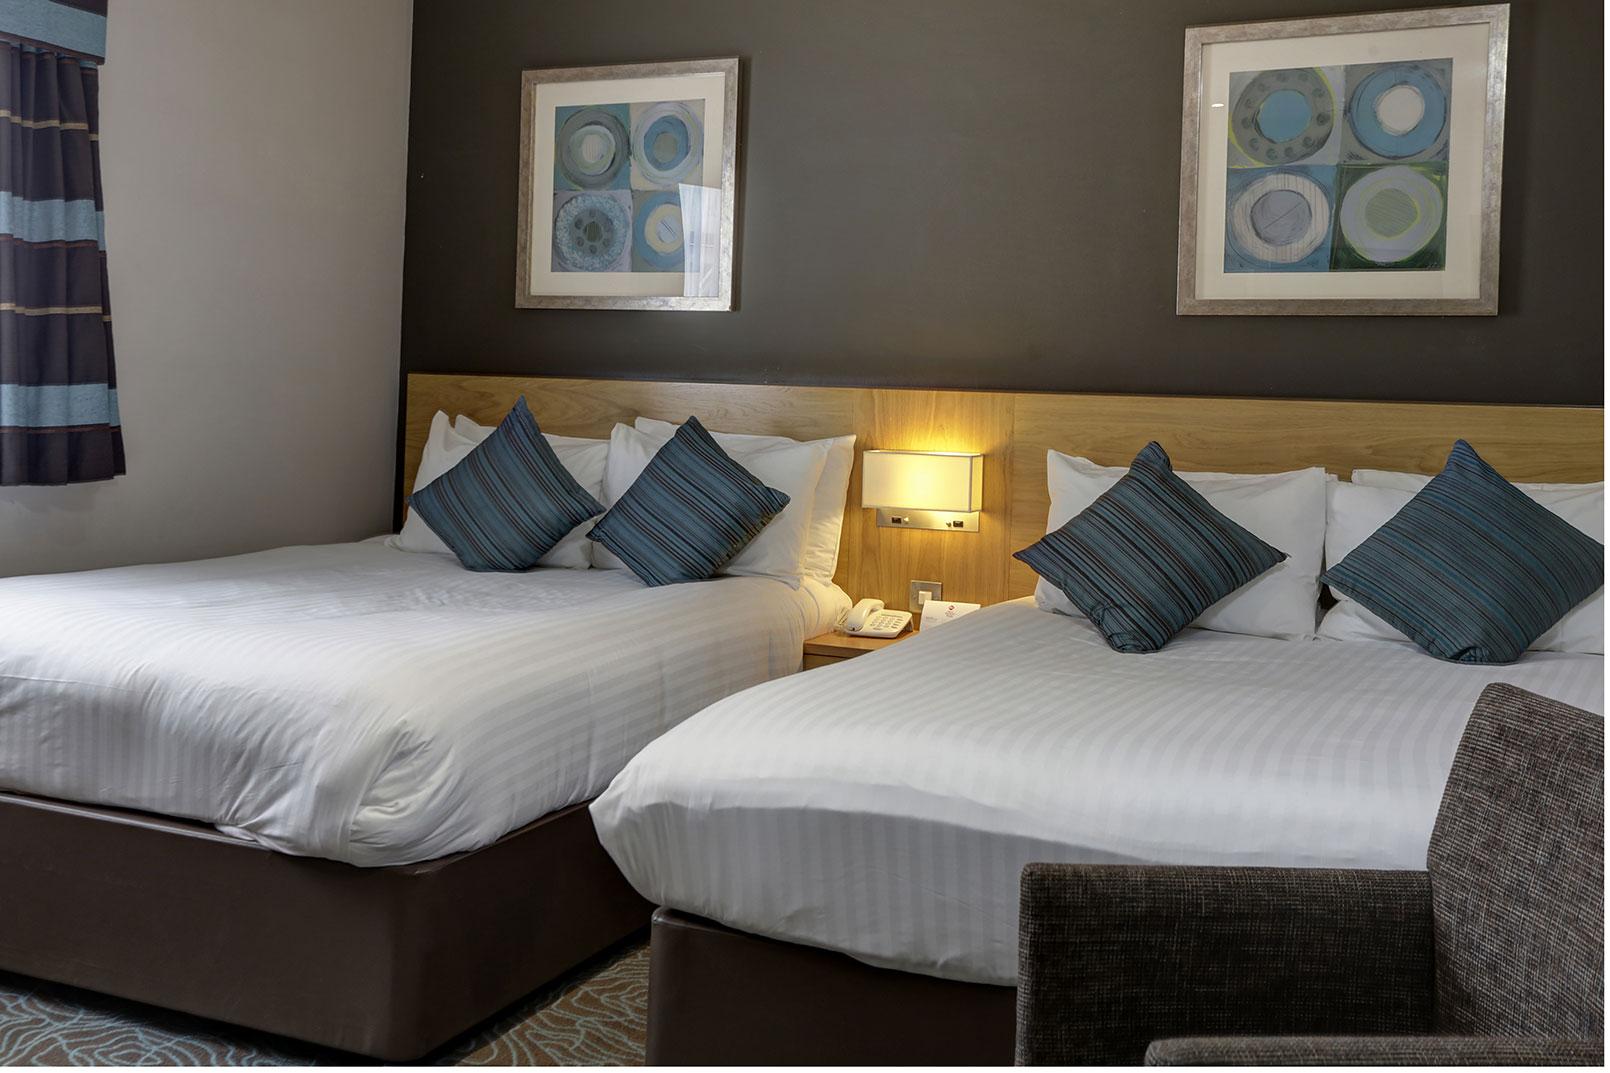 Best Western Westminster Hotel Rooms